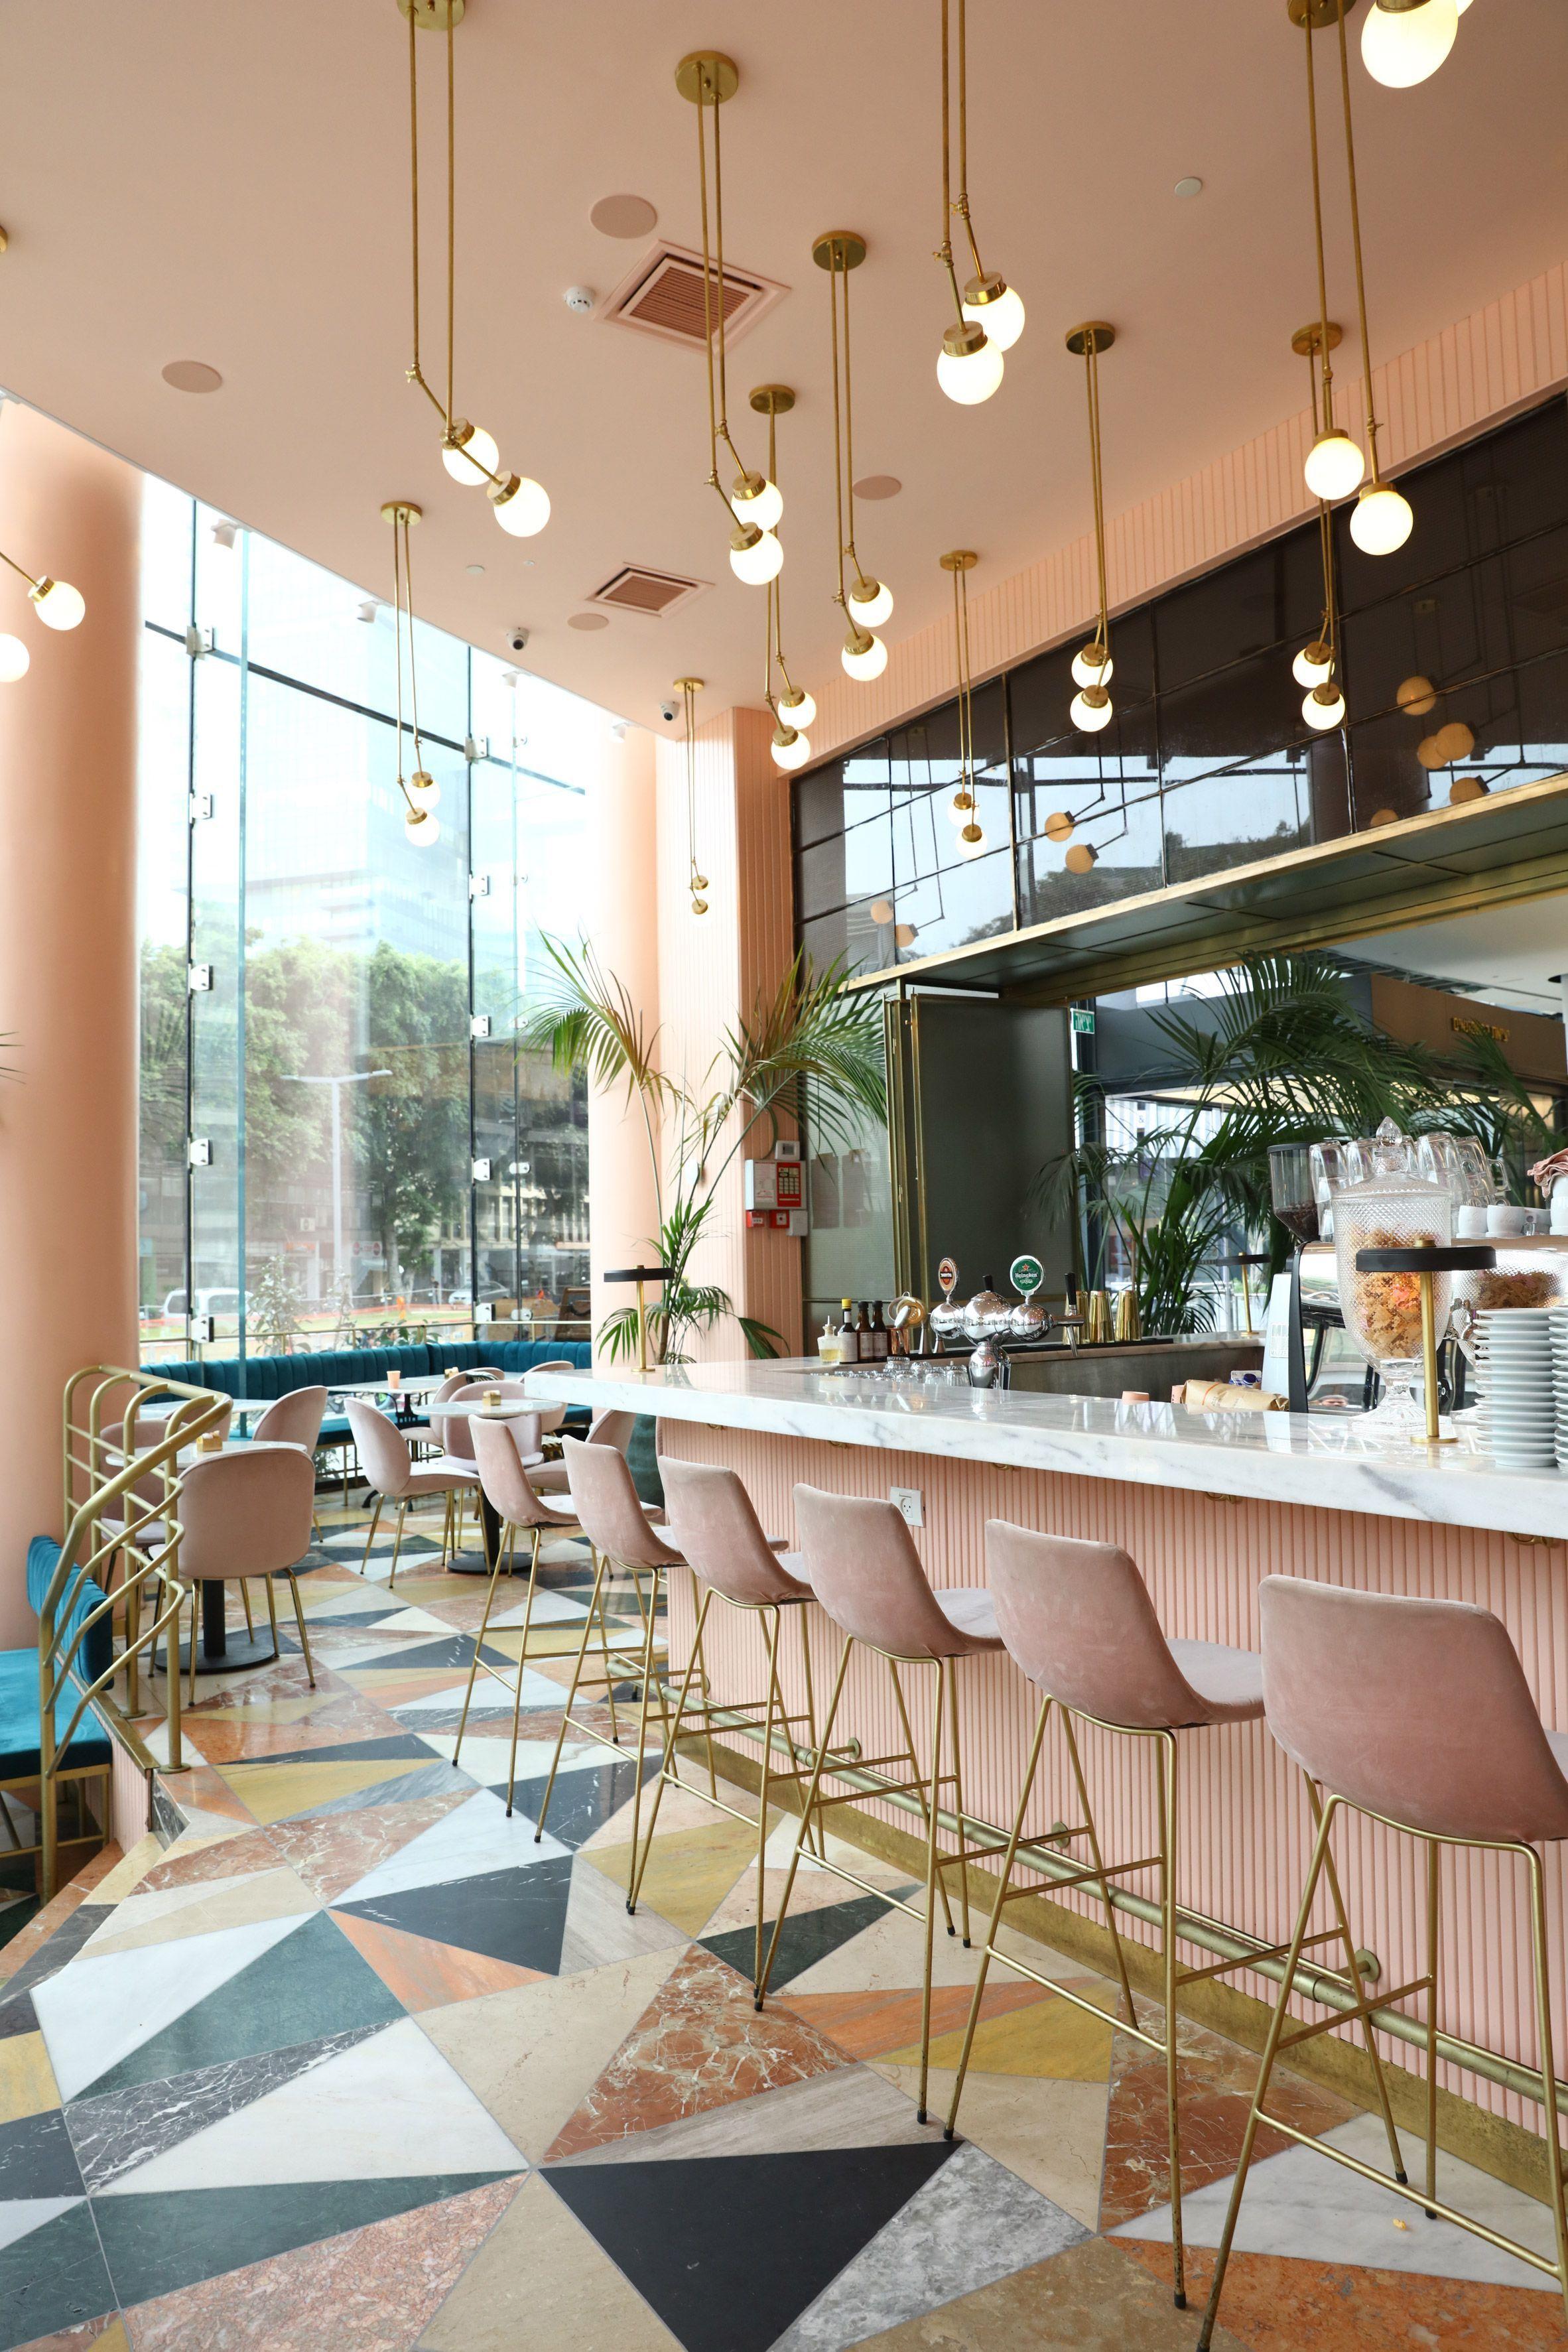 pin by covet group on design aesthetic i hospitality mood rh pinterest com